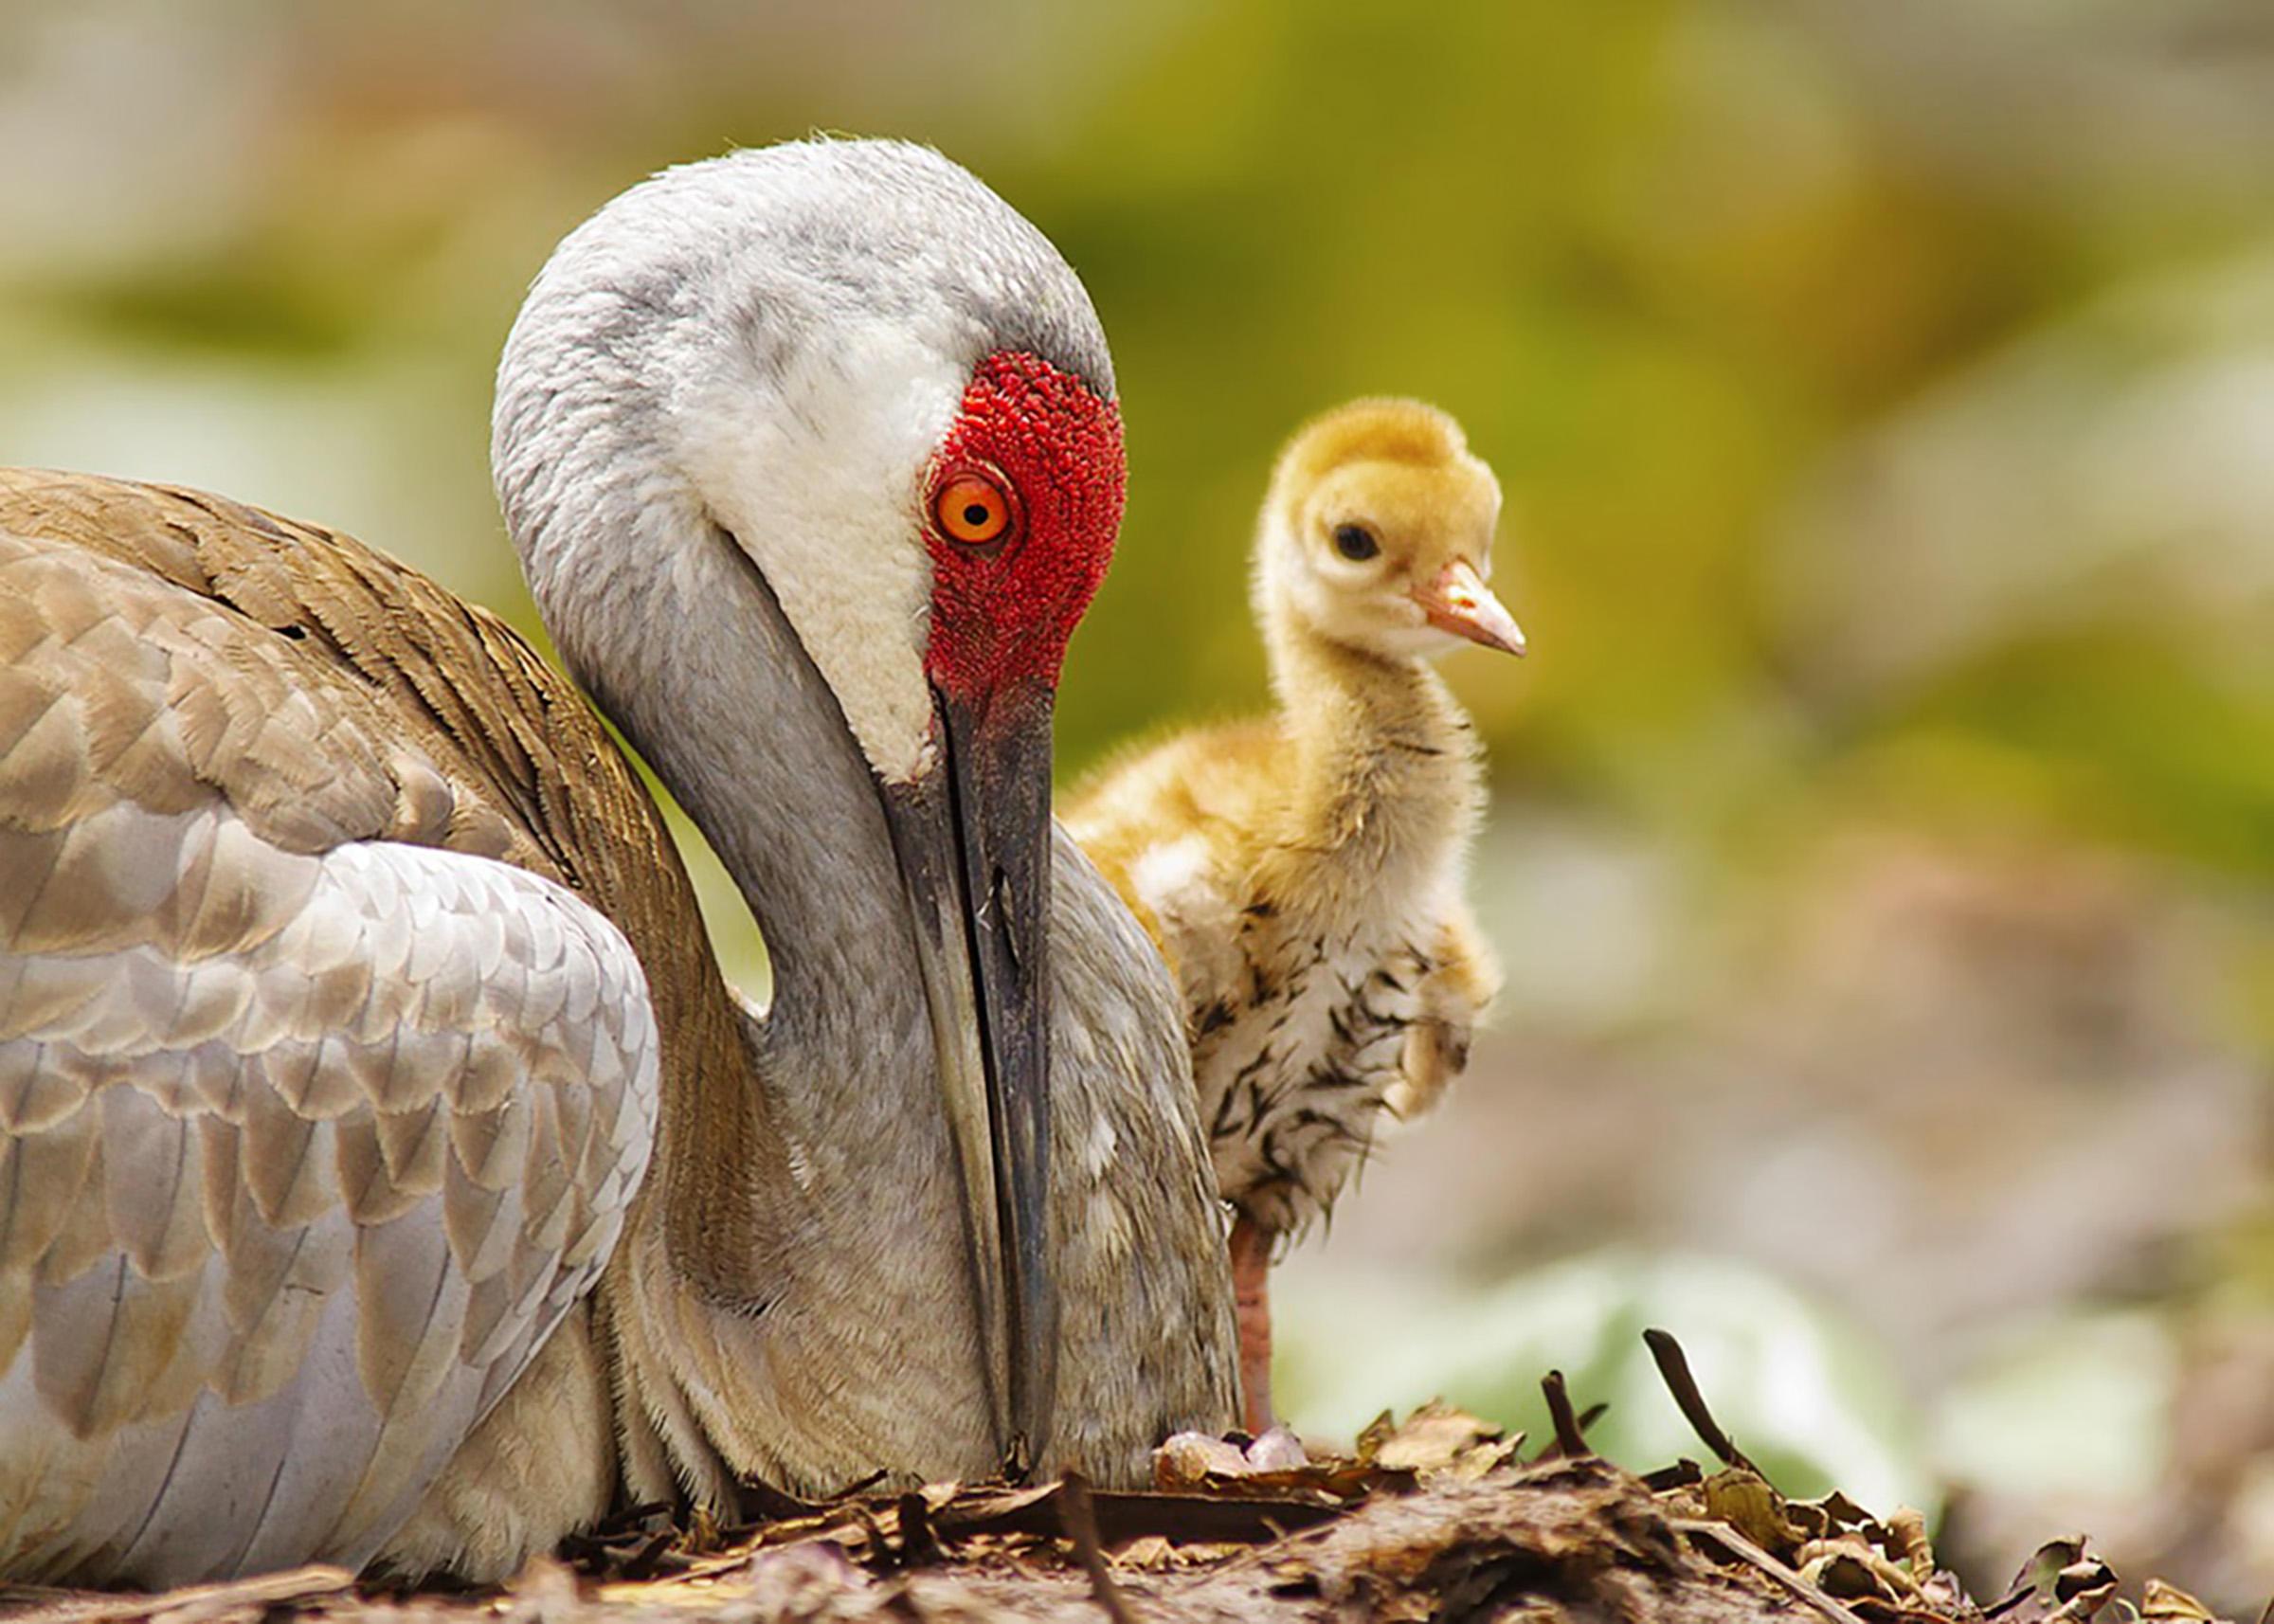 Sandhill crane photo